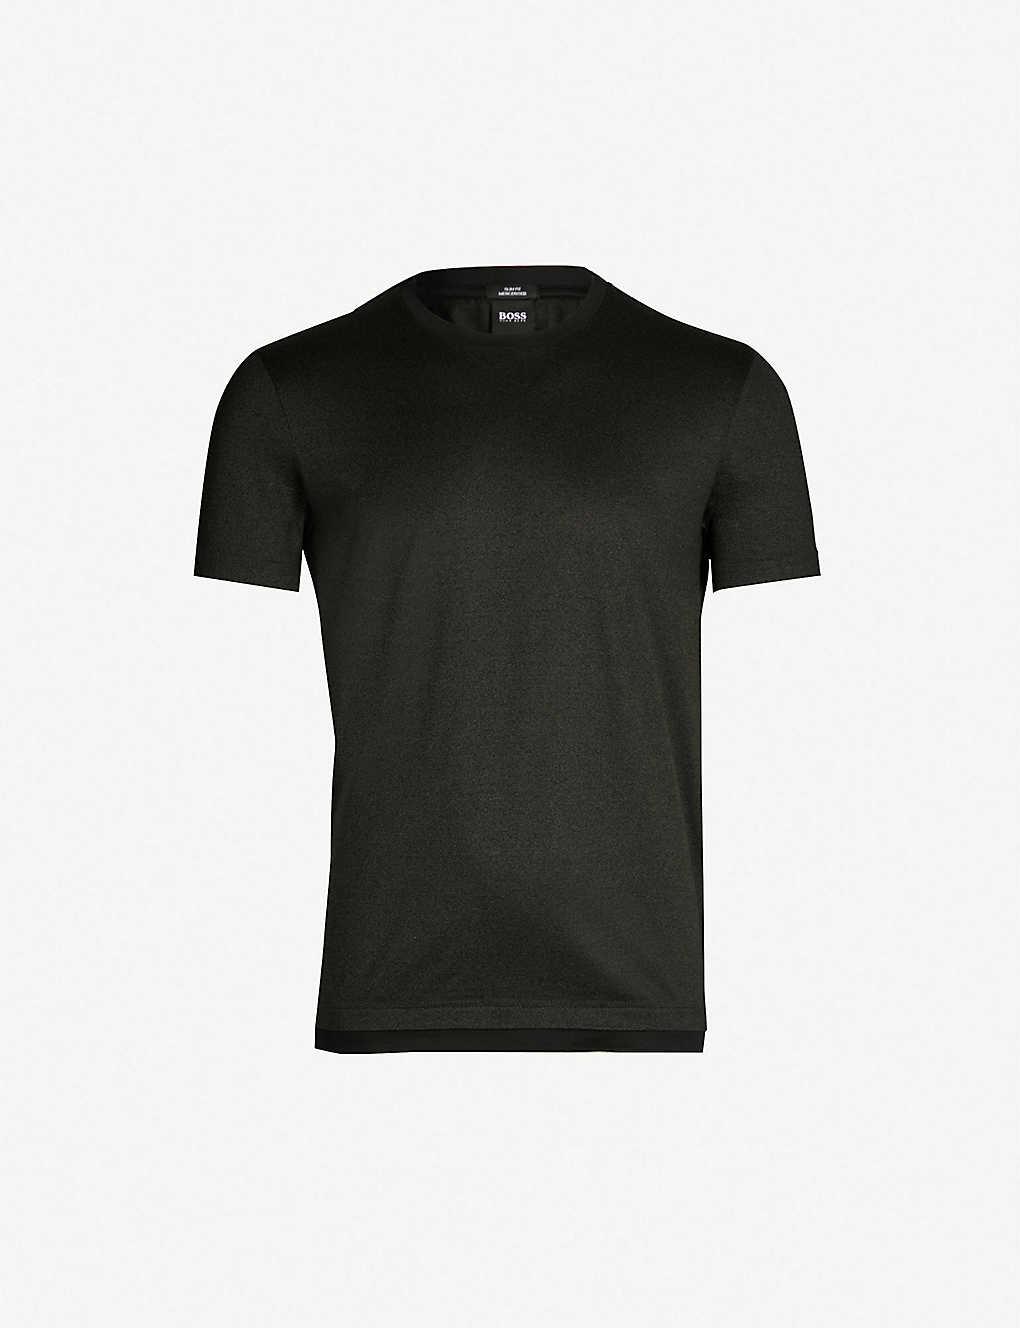 6c840fae98 BOSS - Contrast-trim cotton-jersey T-shirt   Selfridges.com